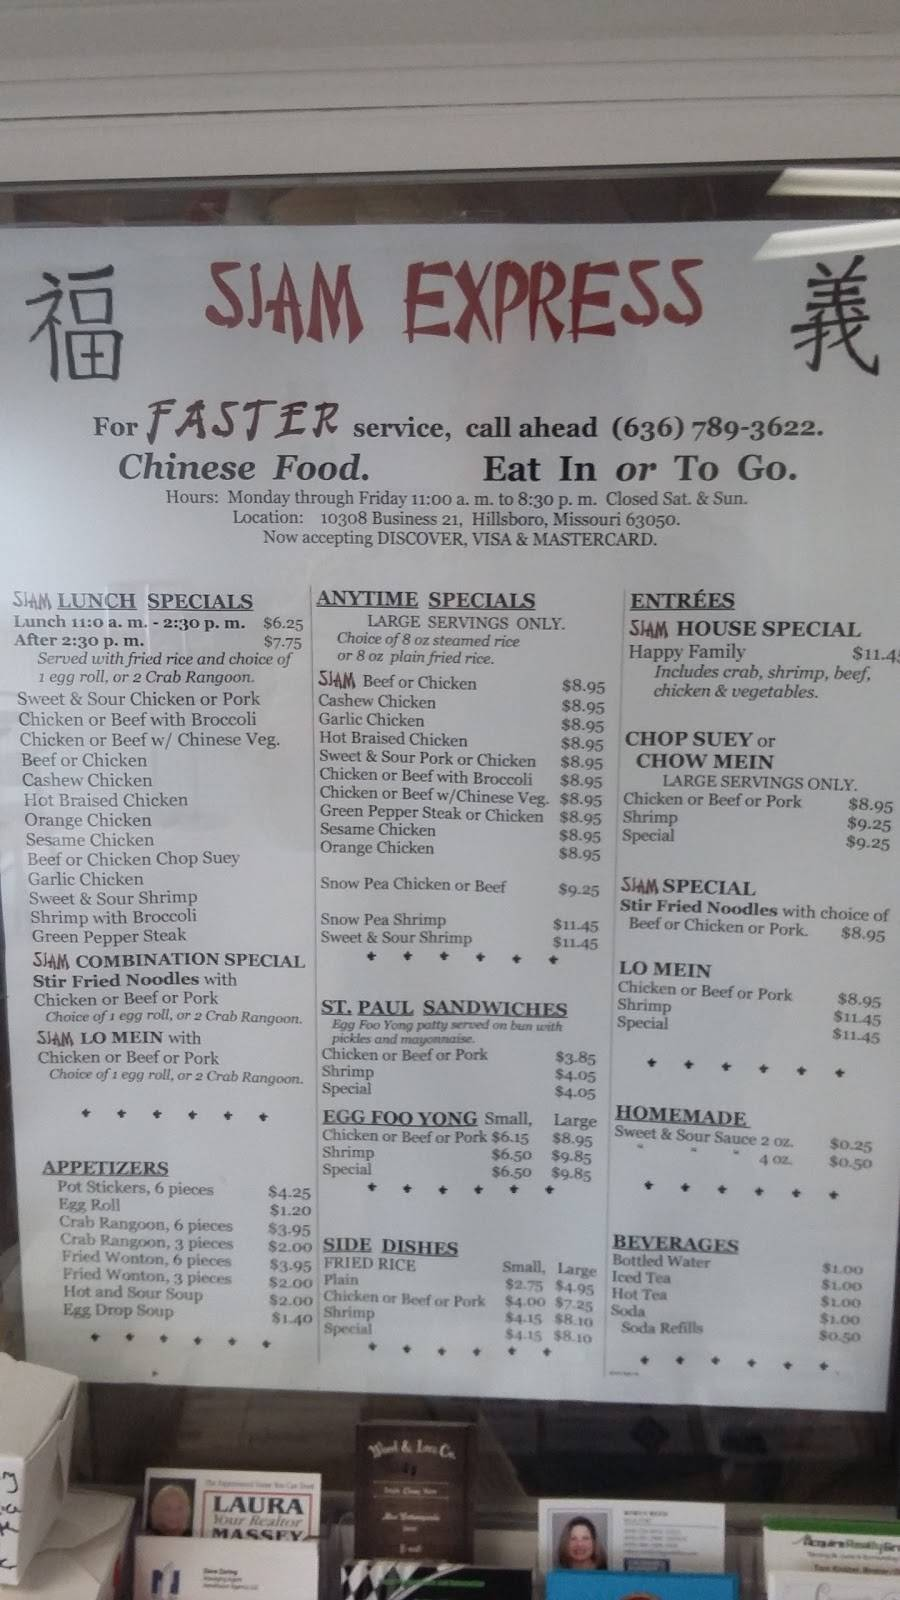 Siam Express | restaurant | 10308 MO-21 Bus, Hillsboro, MO 63050, USA | 6367893622 OR +1 636-789-3622